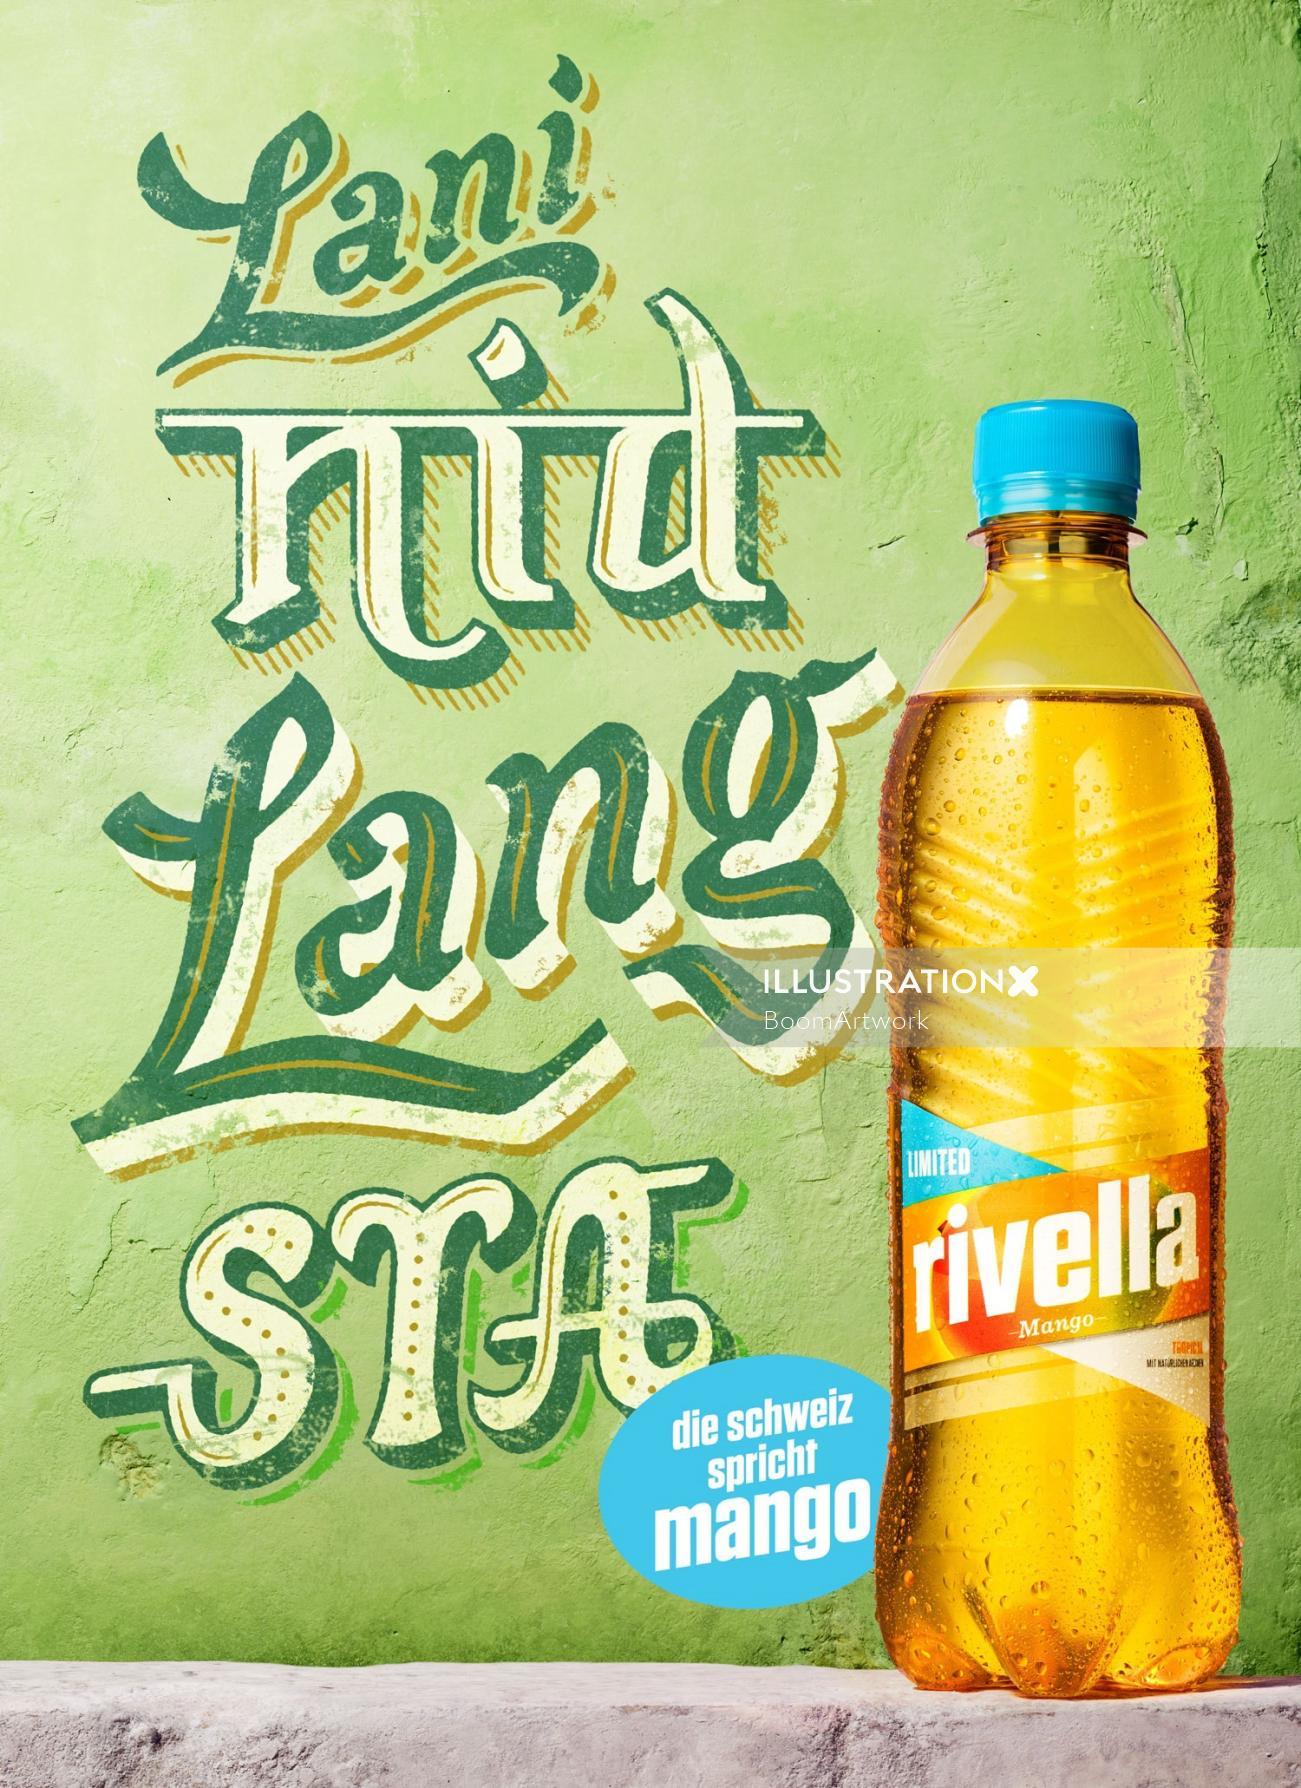 An Illustration For Rivella Mango